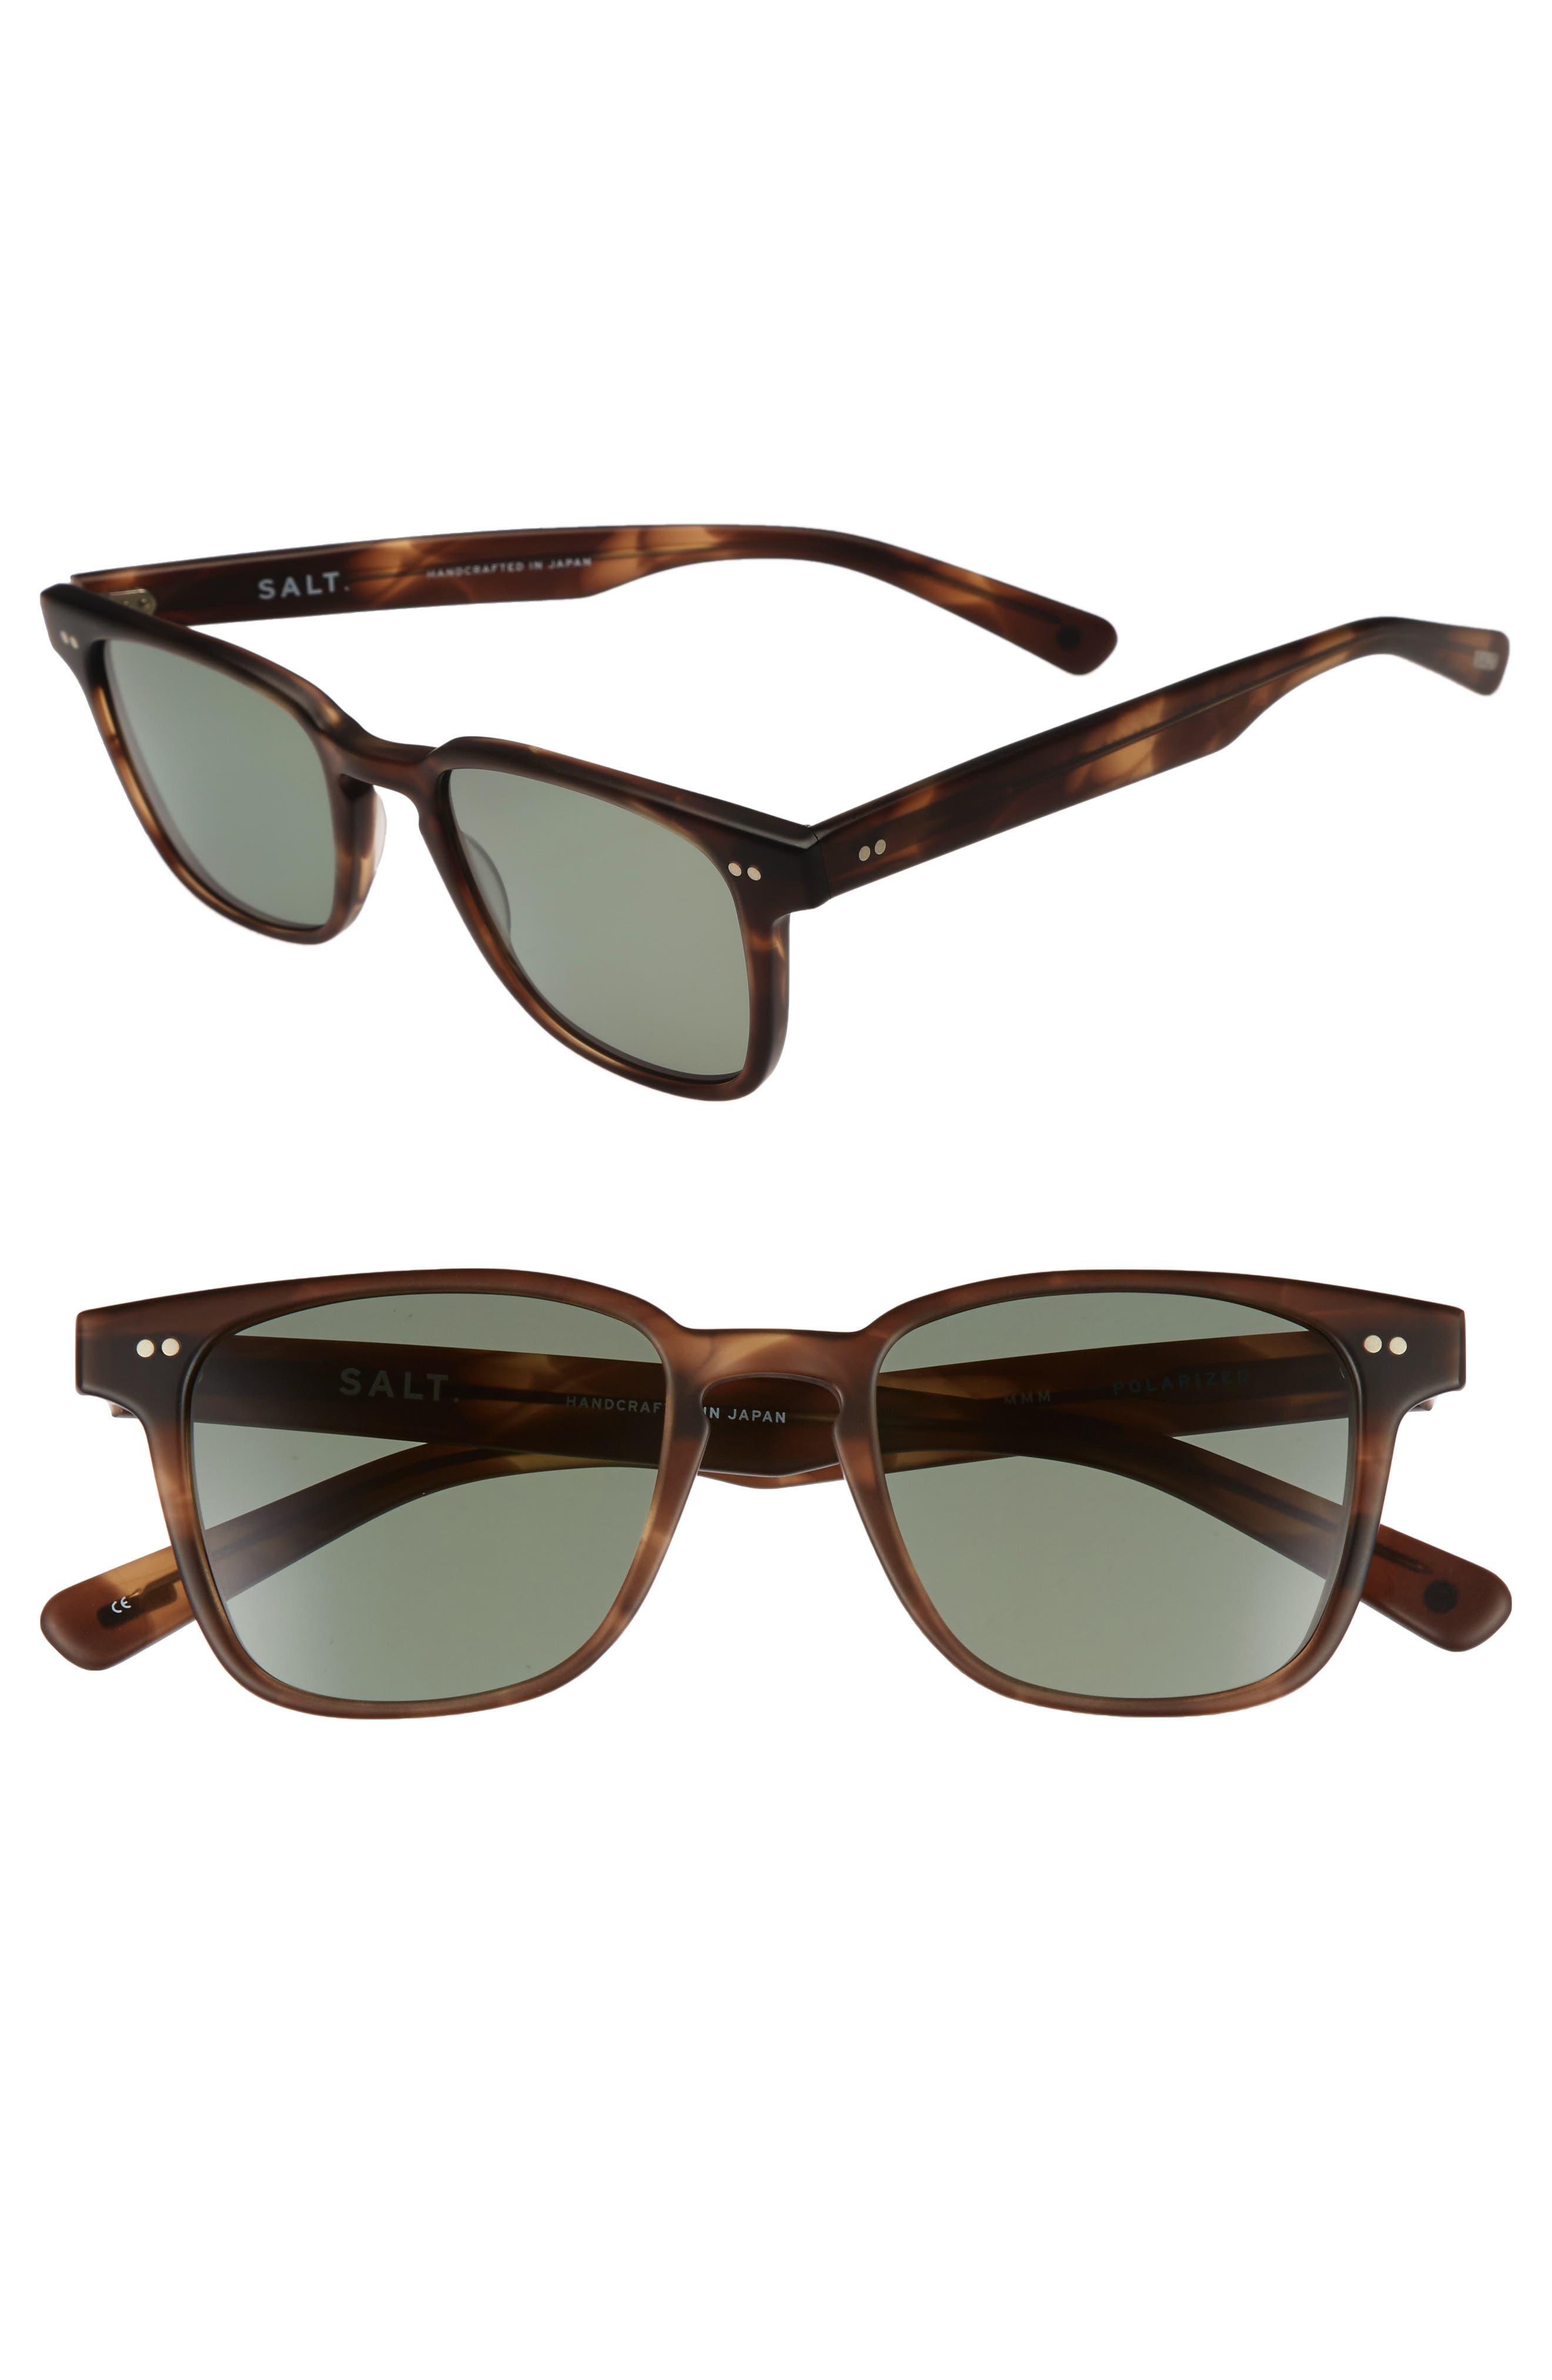 SALT Reiner 51mm Polarized Sunglasses